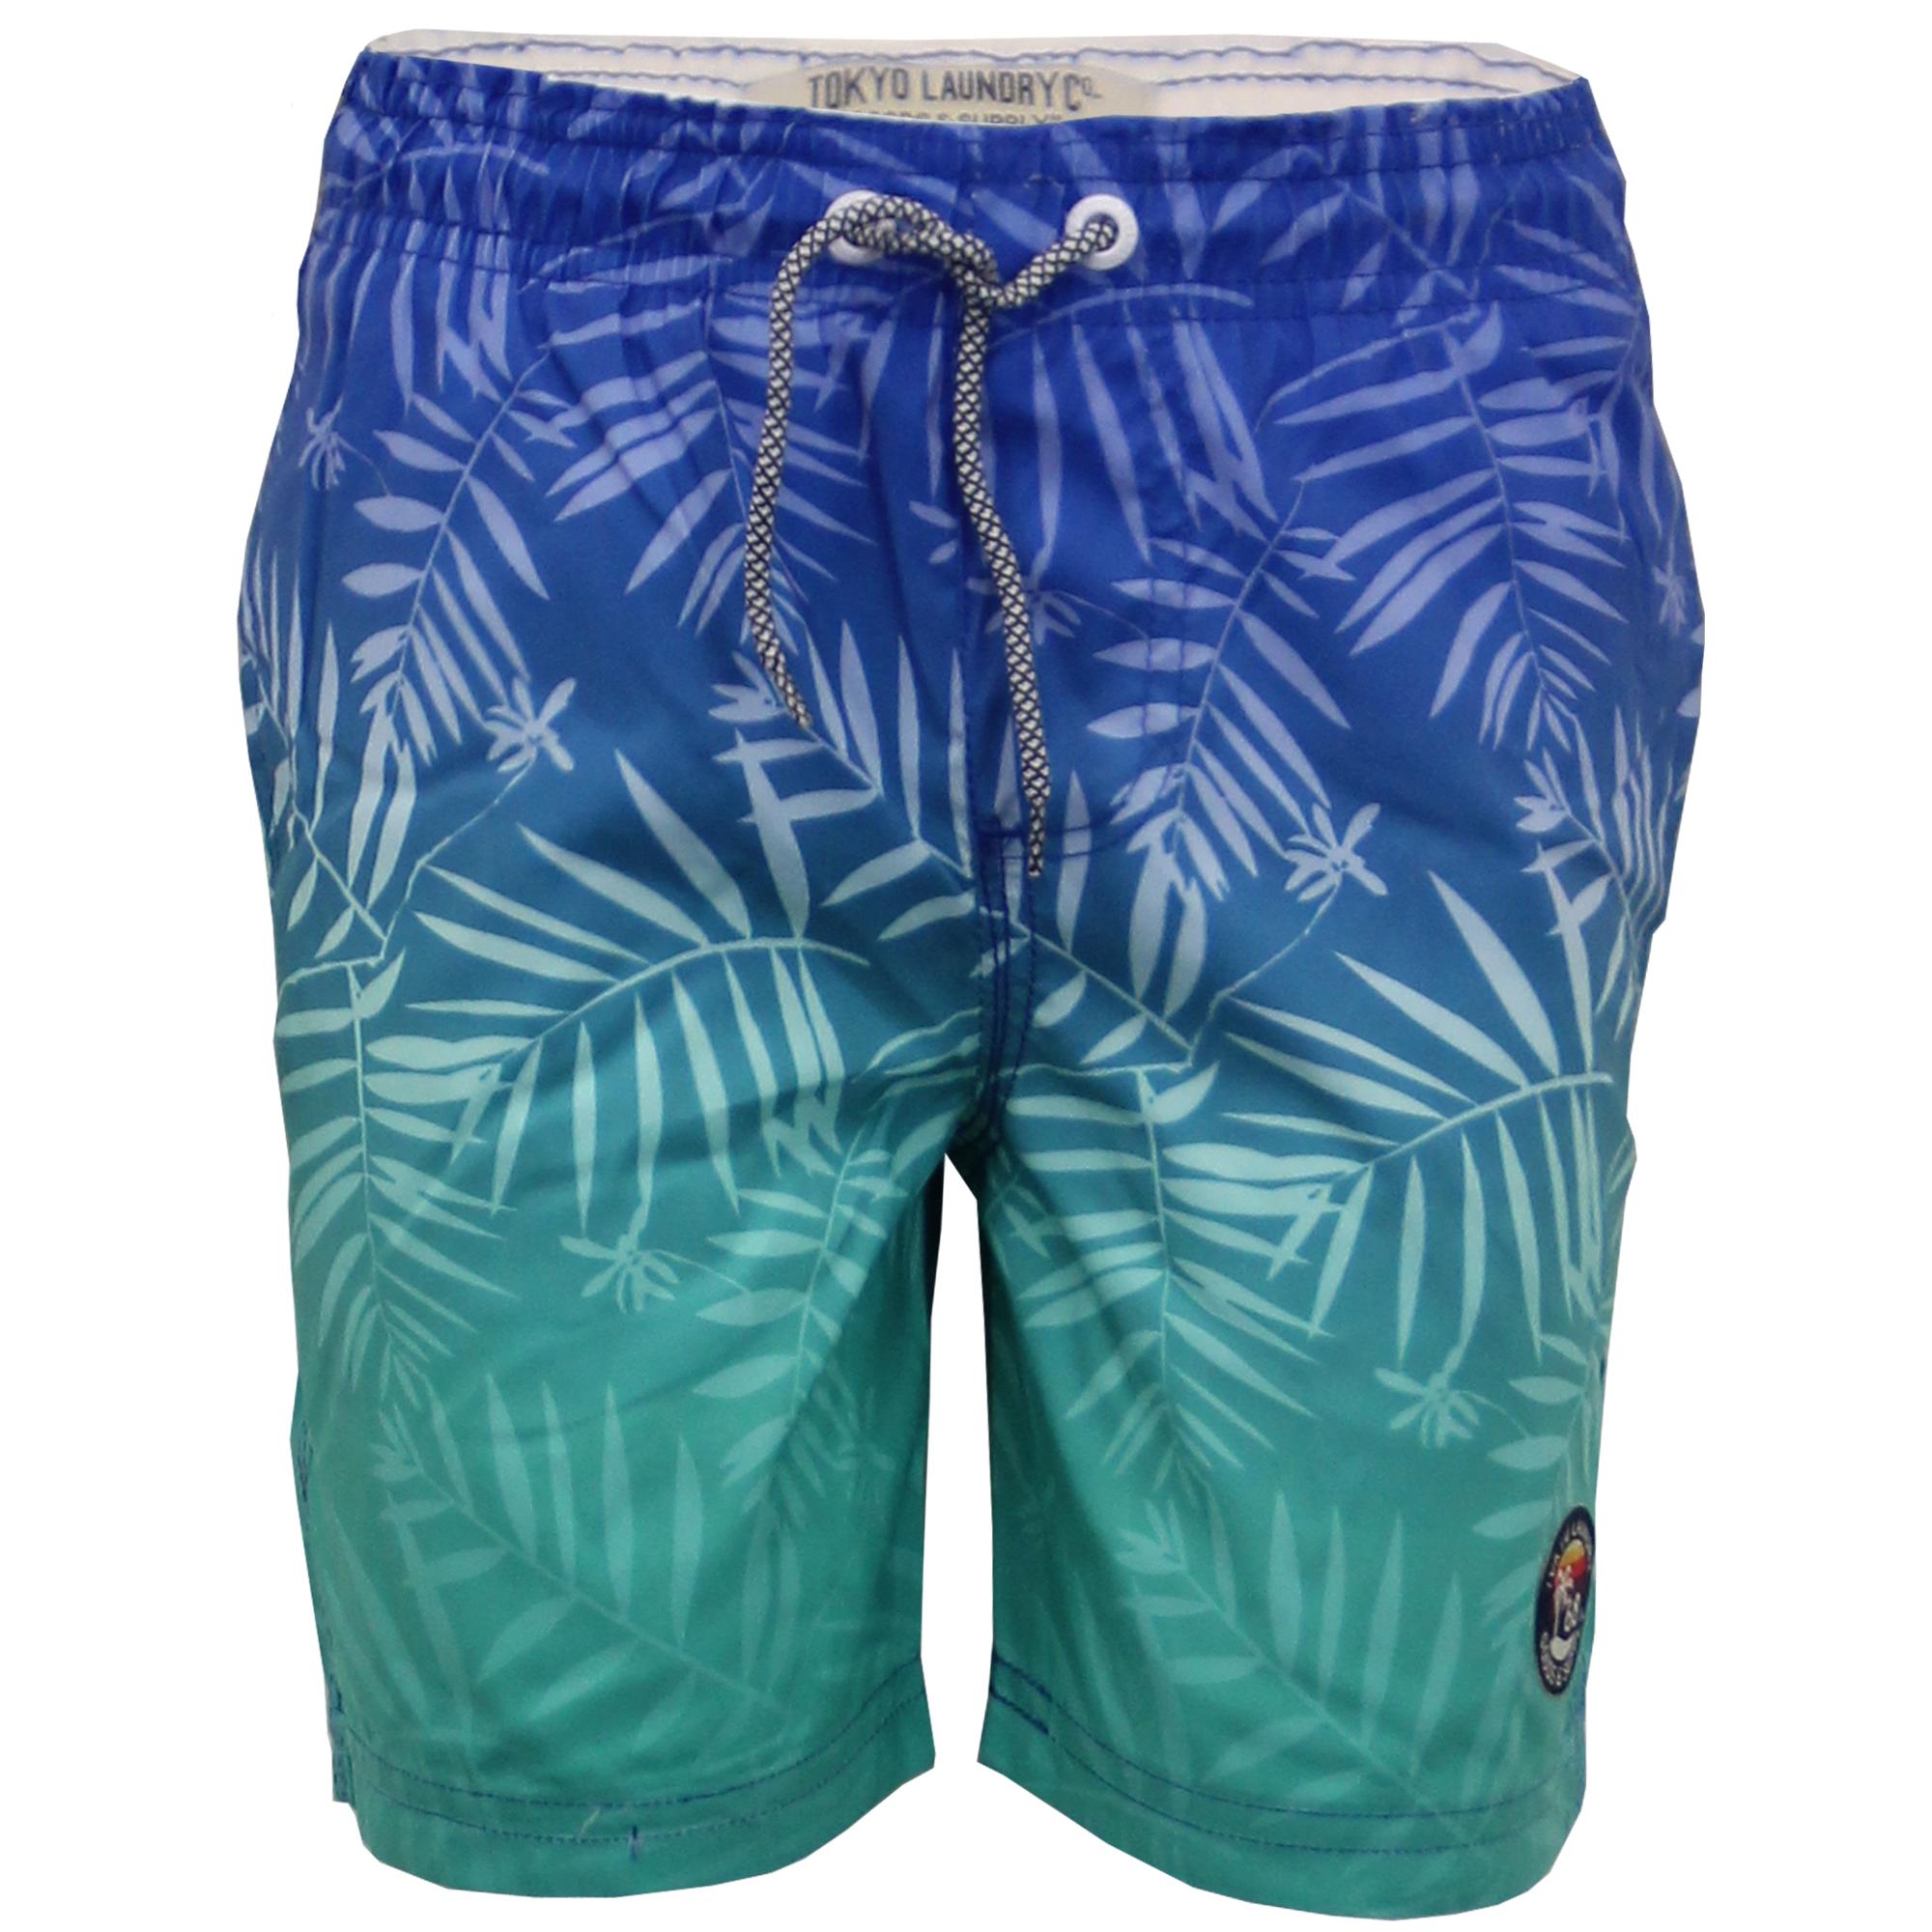 RAGAZZI-nuoto-Shorts-Tokyo-Laundry-bambini-floreale-PALMA-FOGLIA-spiaggia